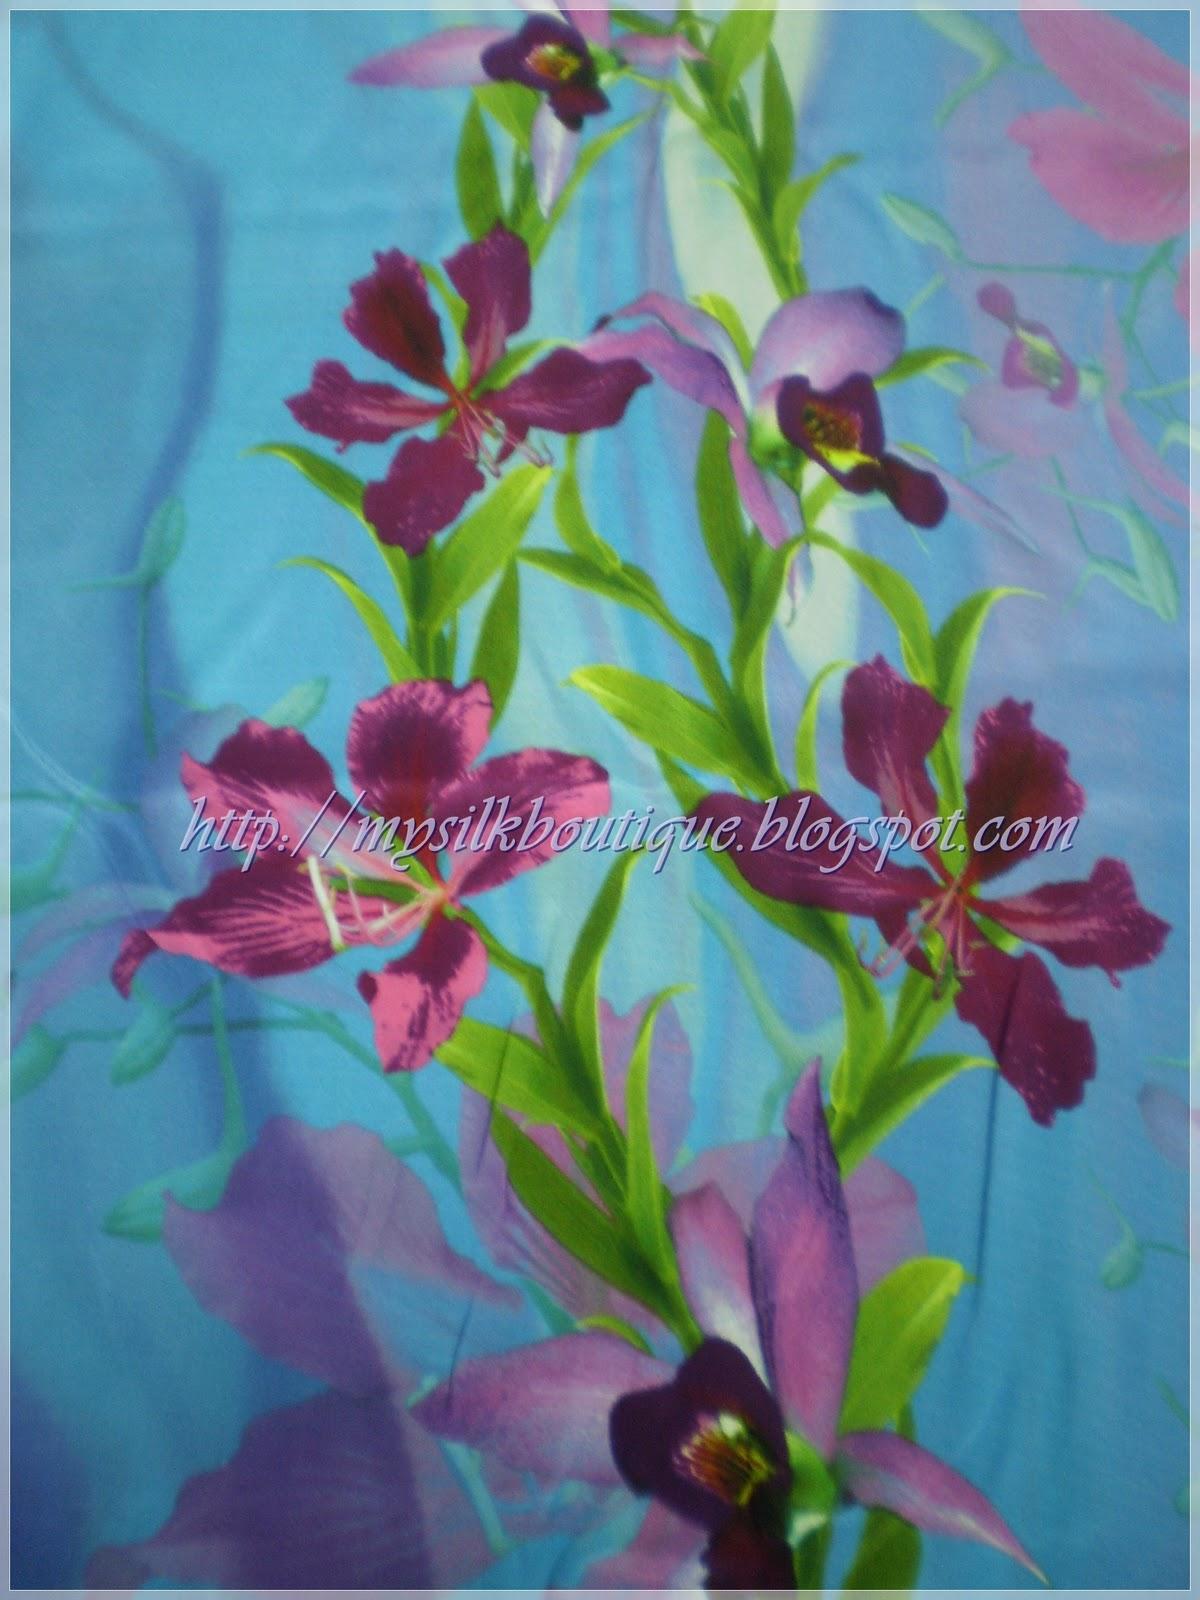 Download image Abstrak Batik Gambar Tato Background Template Incoming 1200x1600